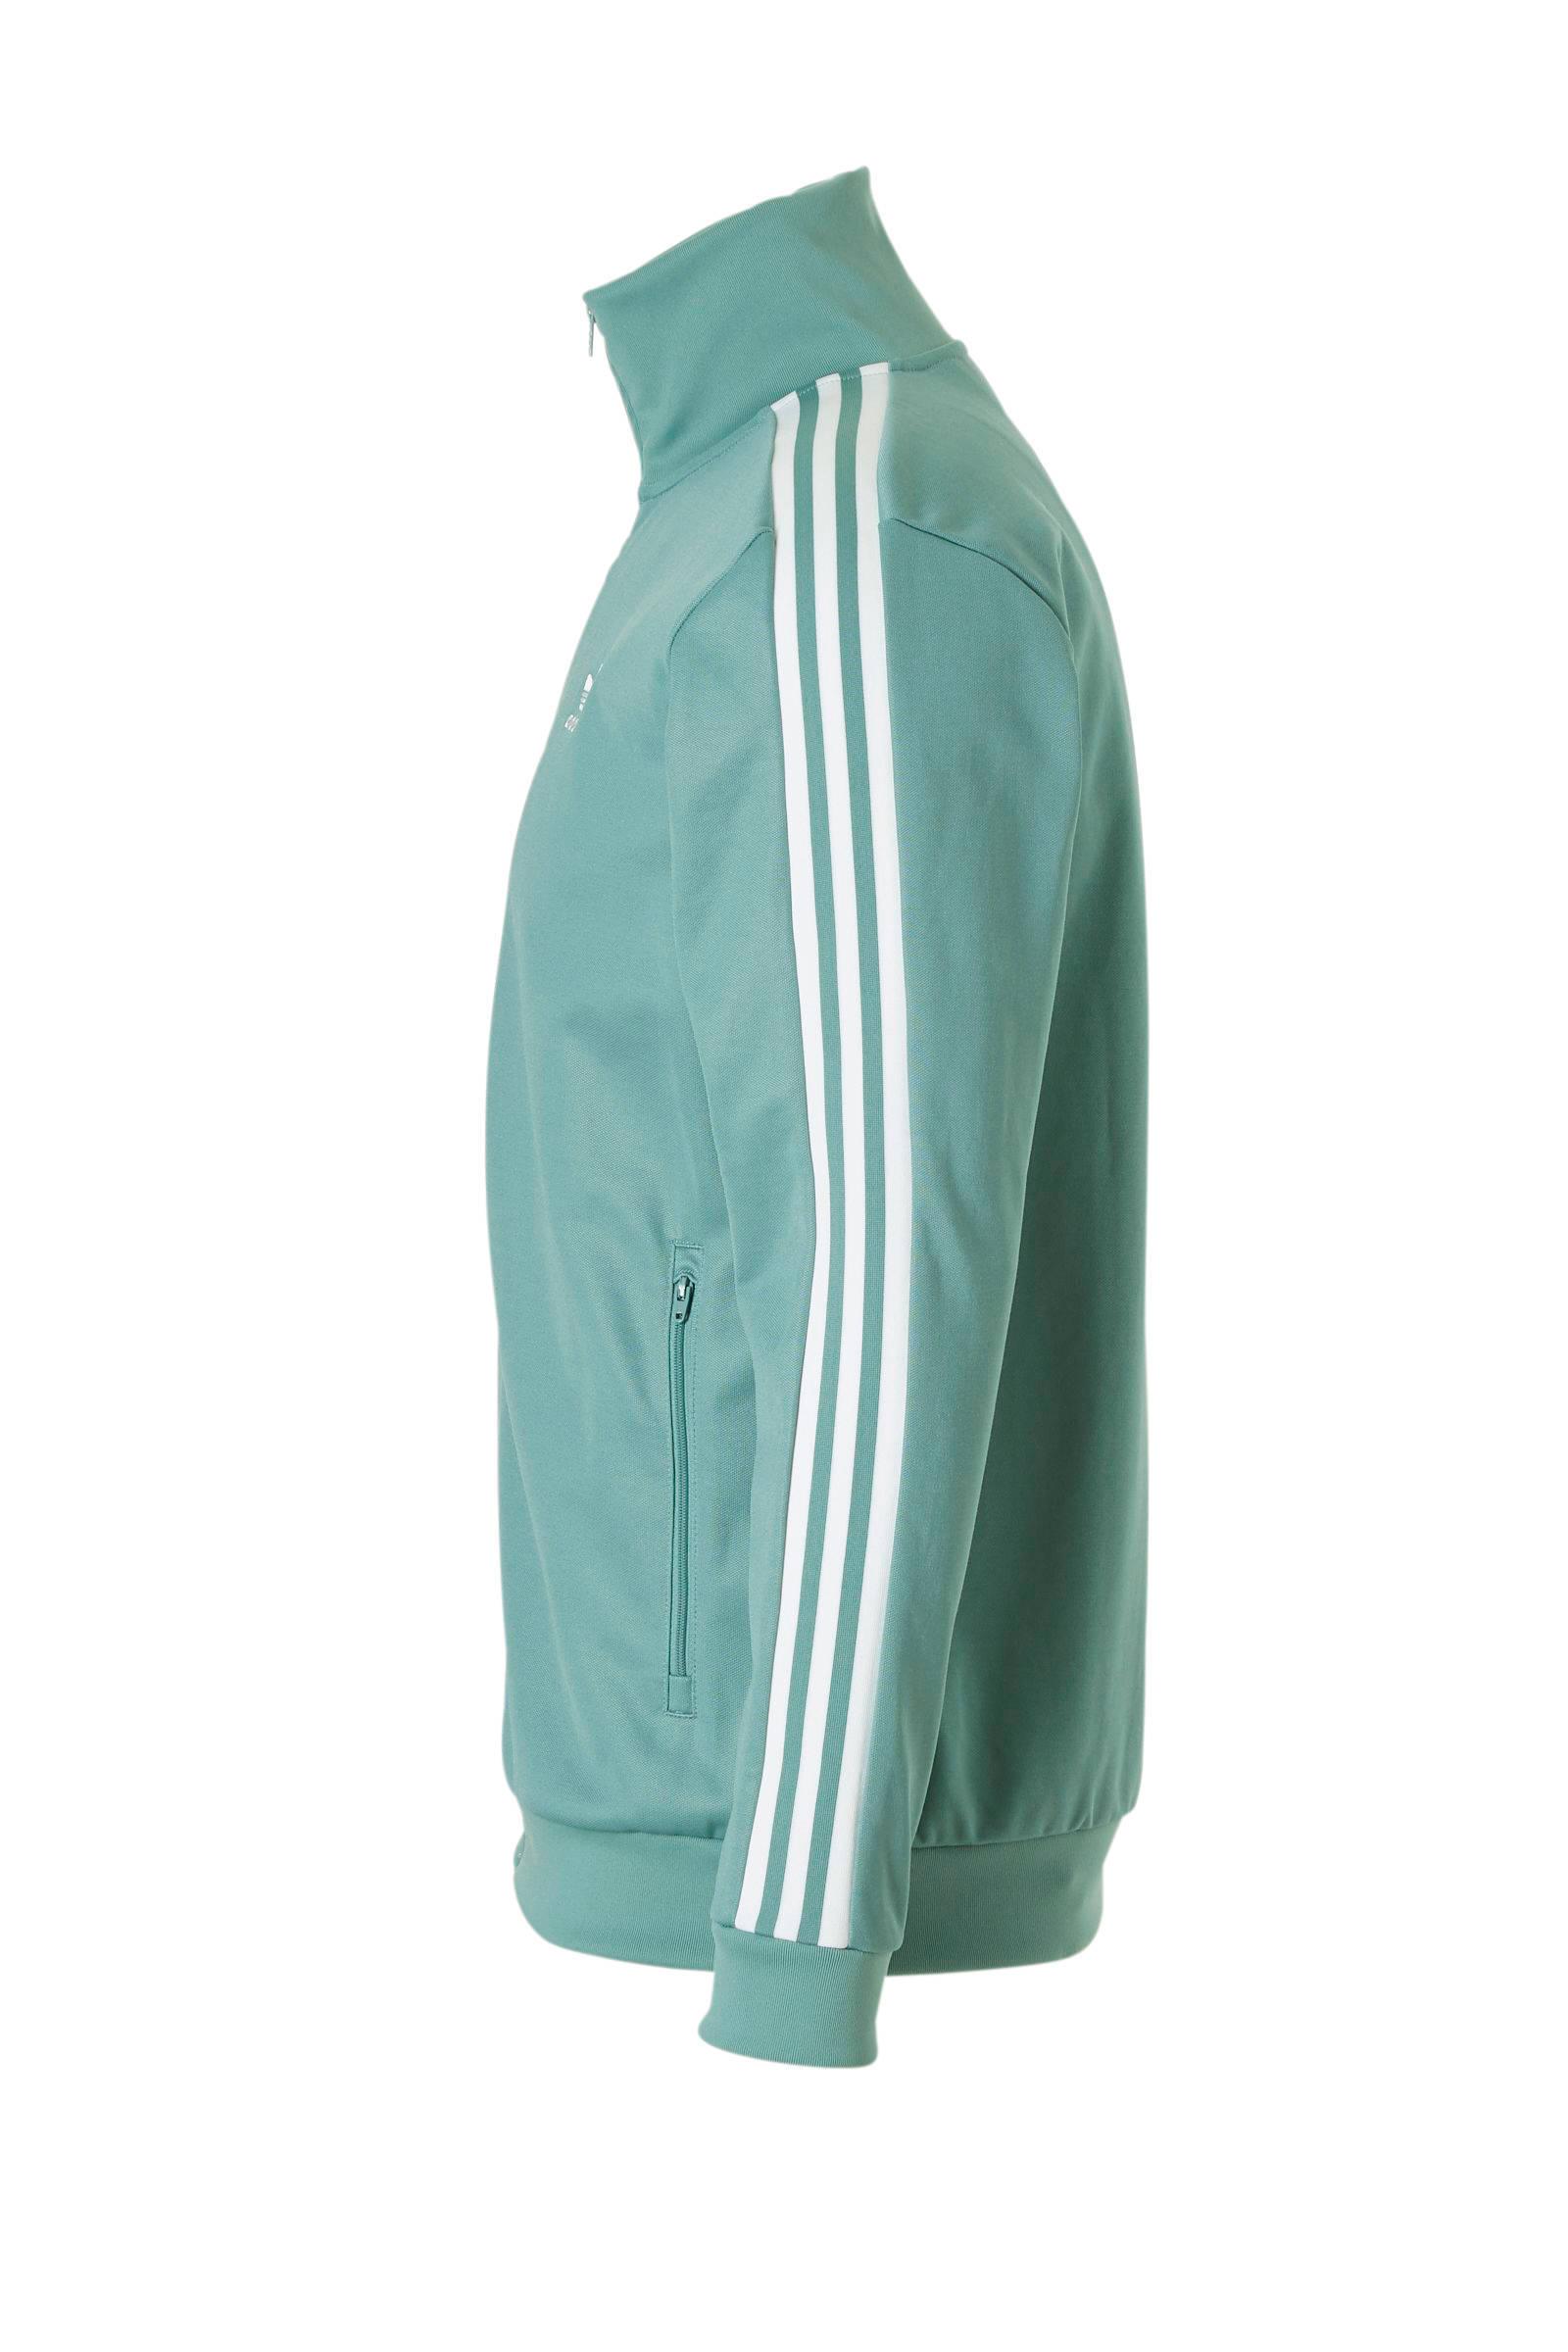 Adidas Vest Originals Vest Adidas Adidas Originals